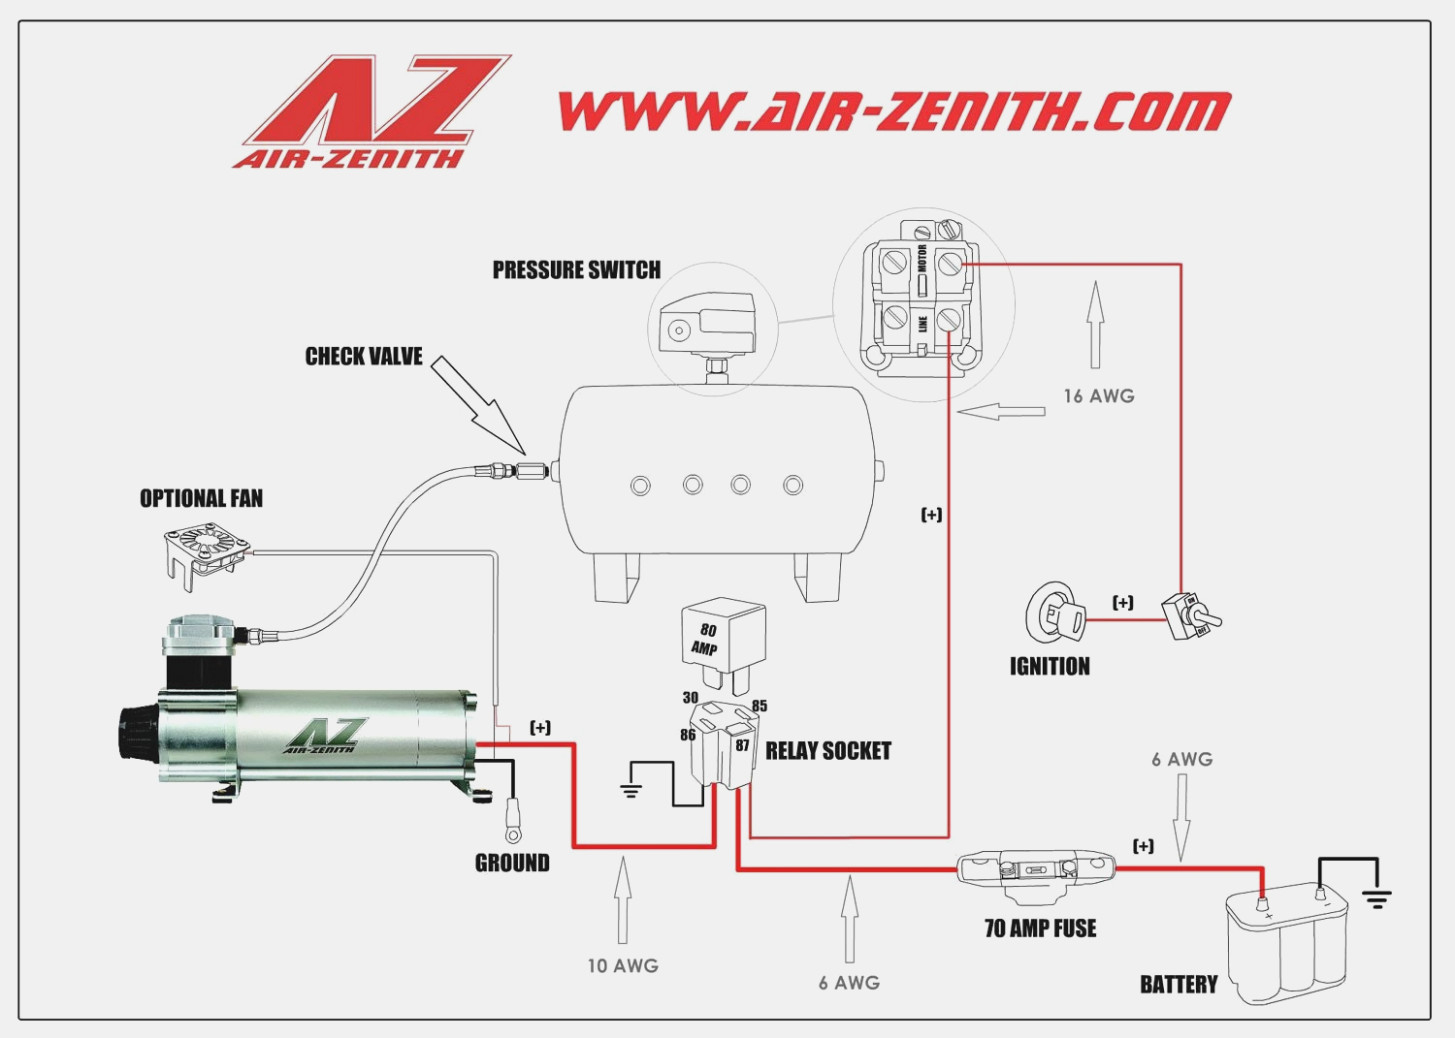 230V 1 Phase Wiring Diagram | Manual E-Books - Air Compressor Wiring Diagram 230V 1 Phase